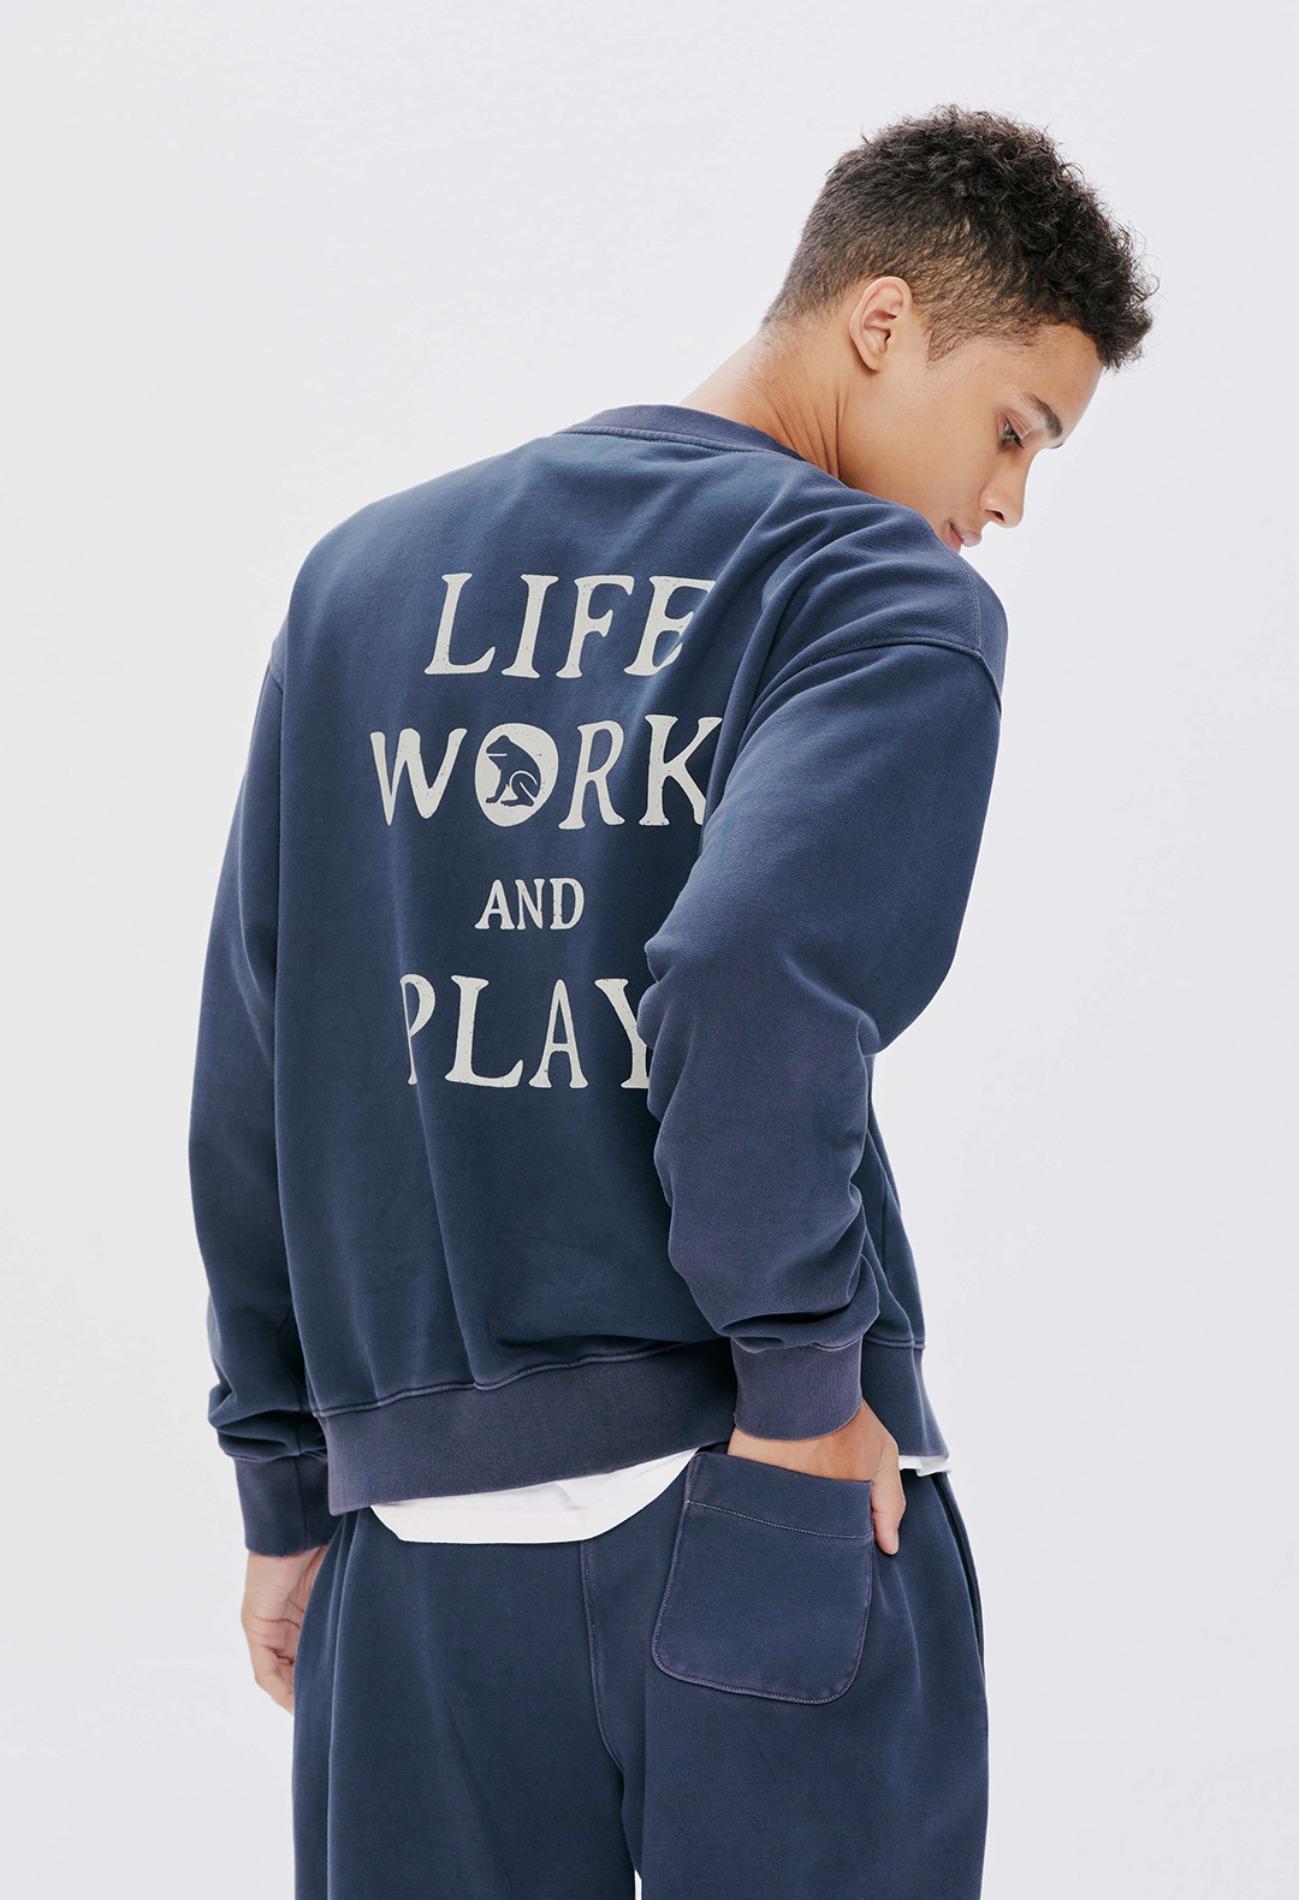 keek Pigment Sweatshirts by KEEK CREW - Navy 스트릿패션 유니섹스브랜드 커플시밀러룩 남자쇼핑몰 여성의류쇼핑몰 후드티 힙색